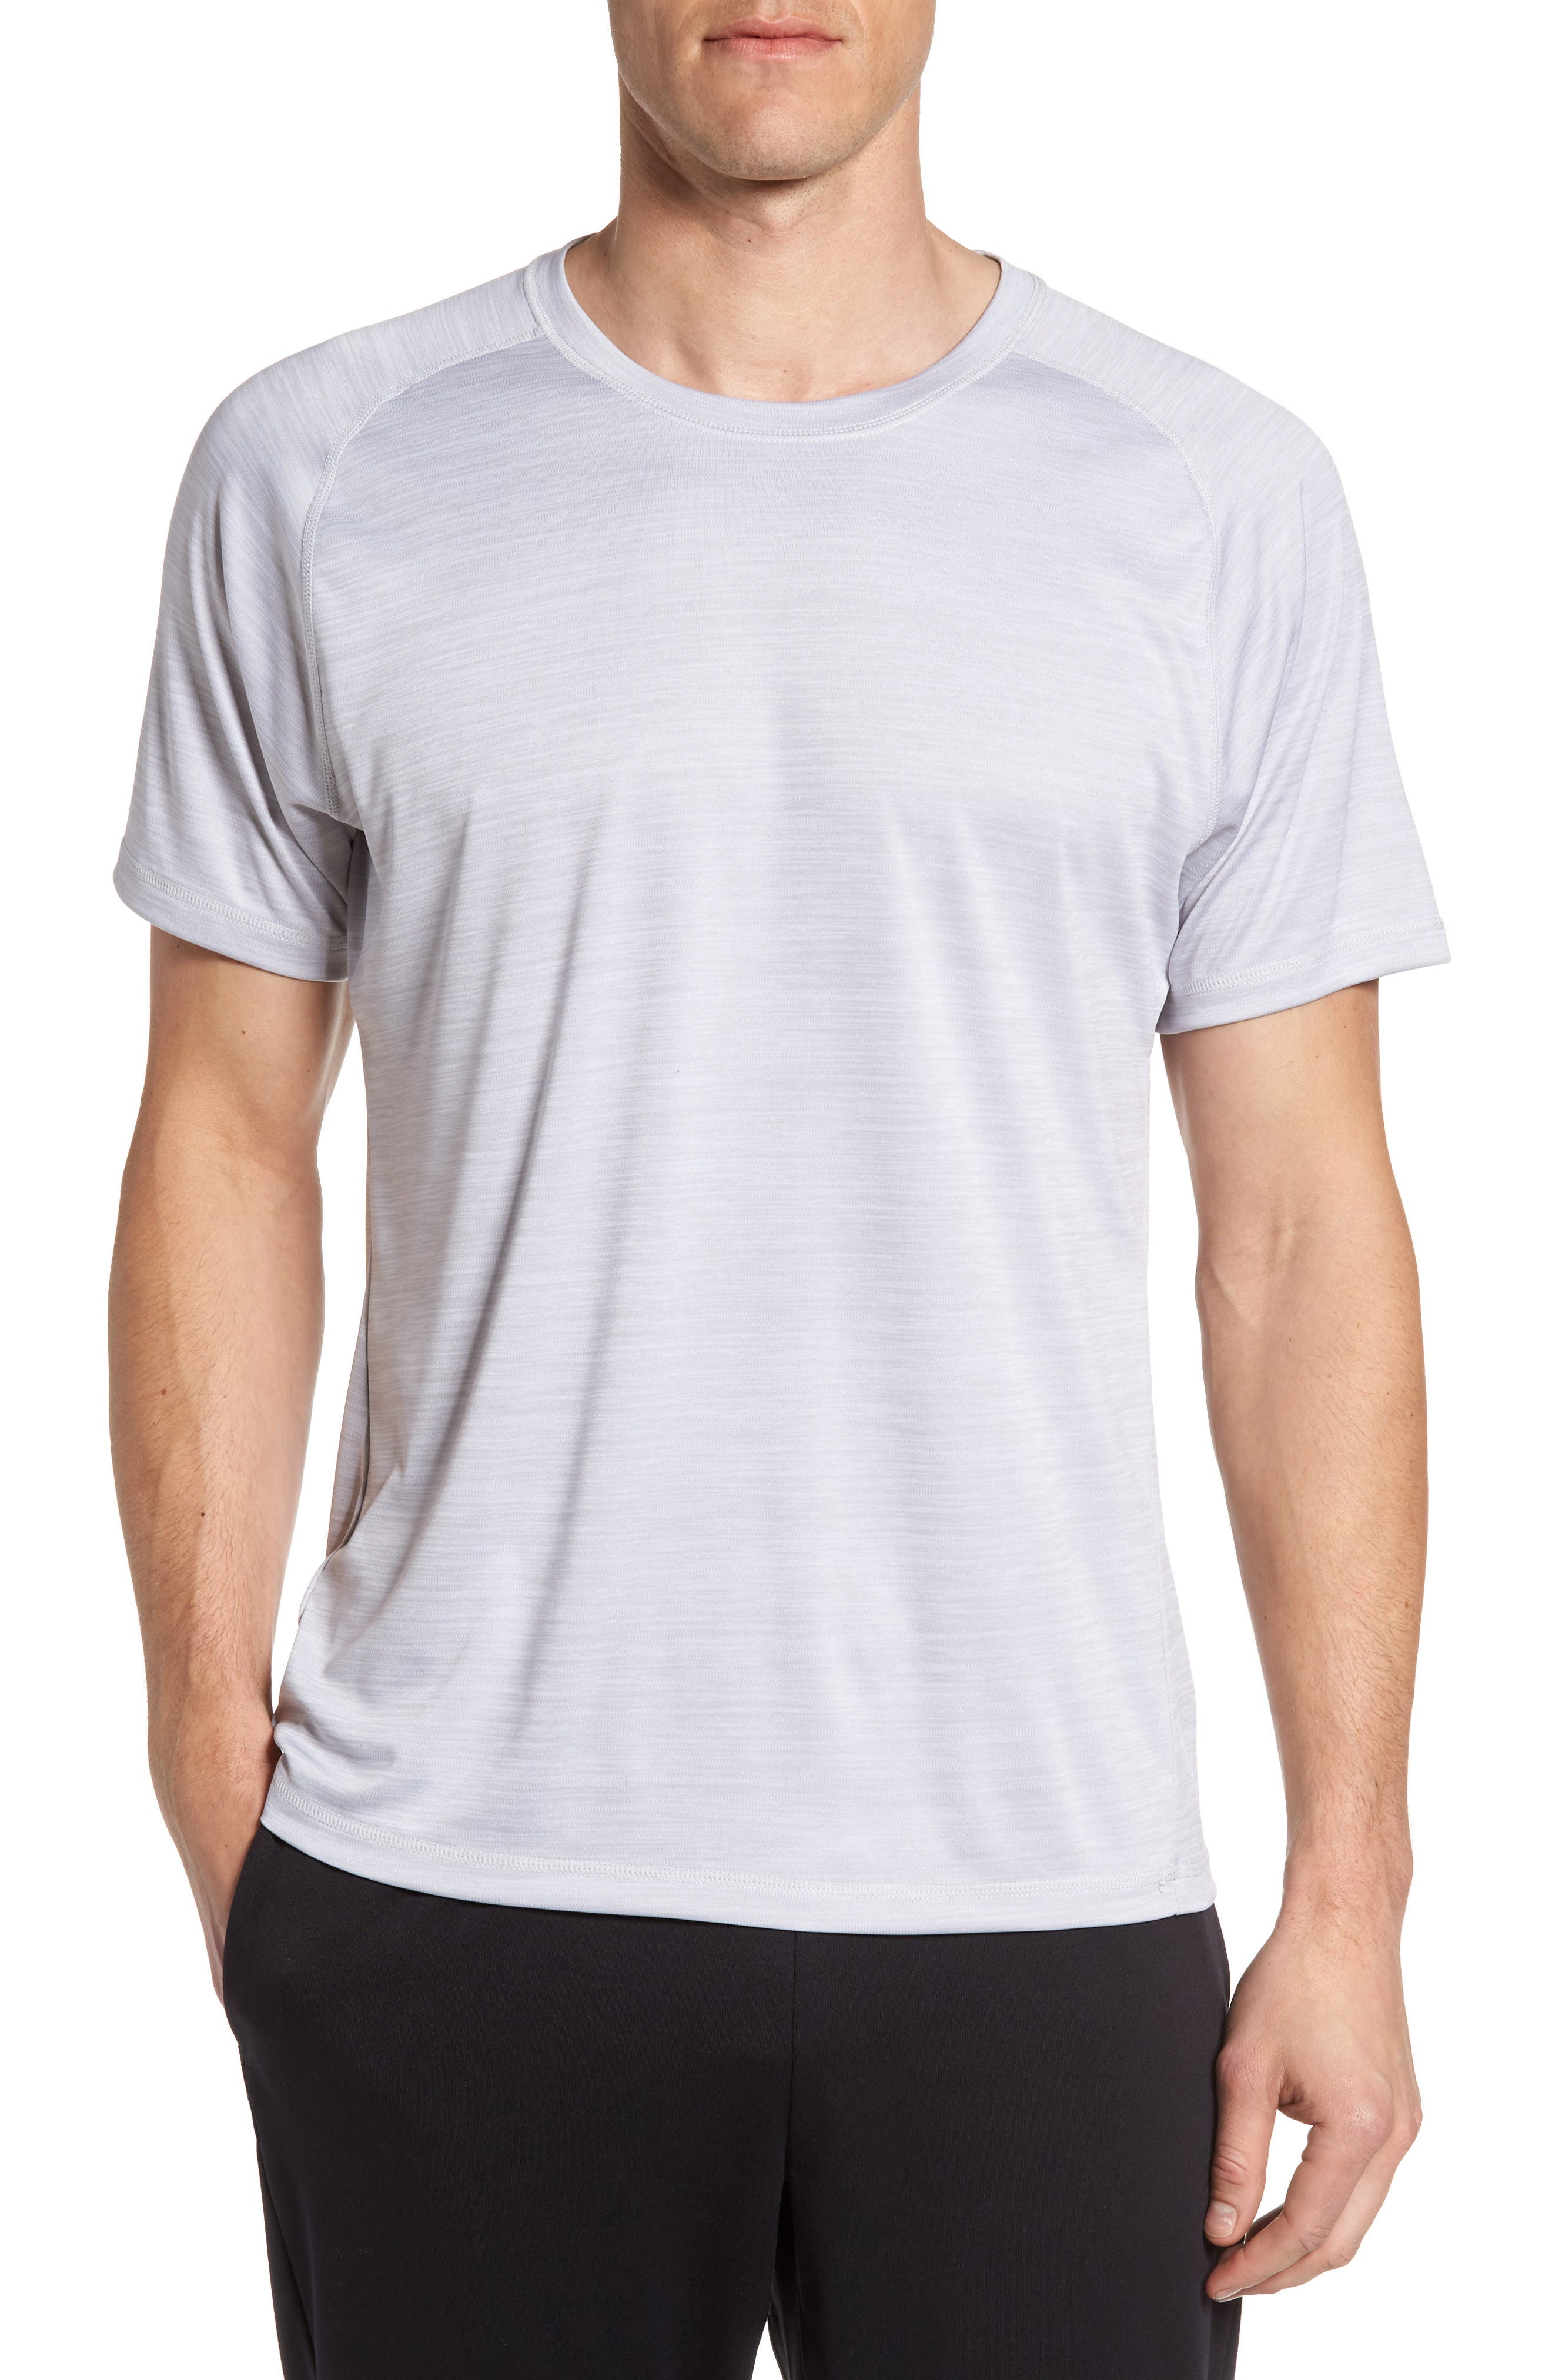 Main Image - Zella Triplite T-Shirt